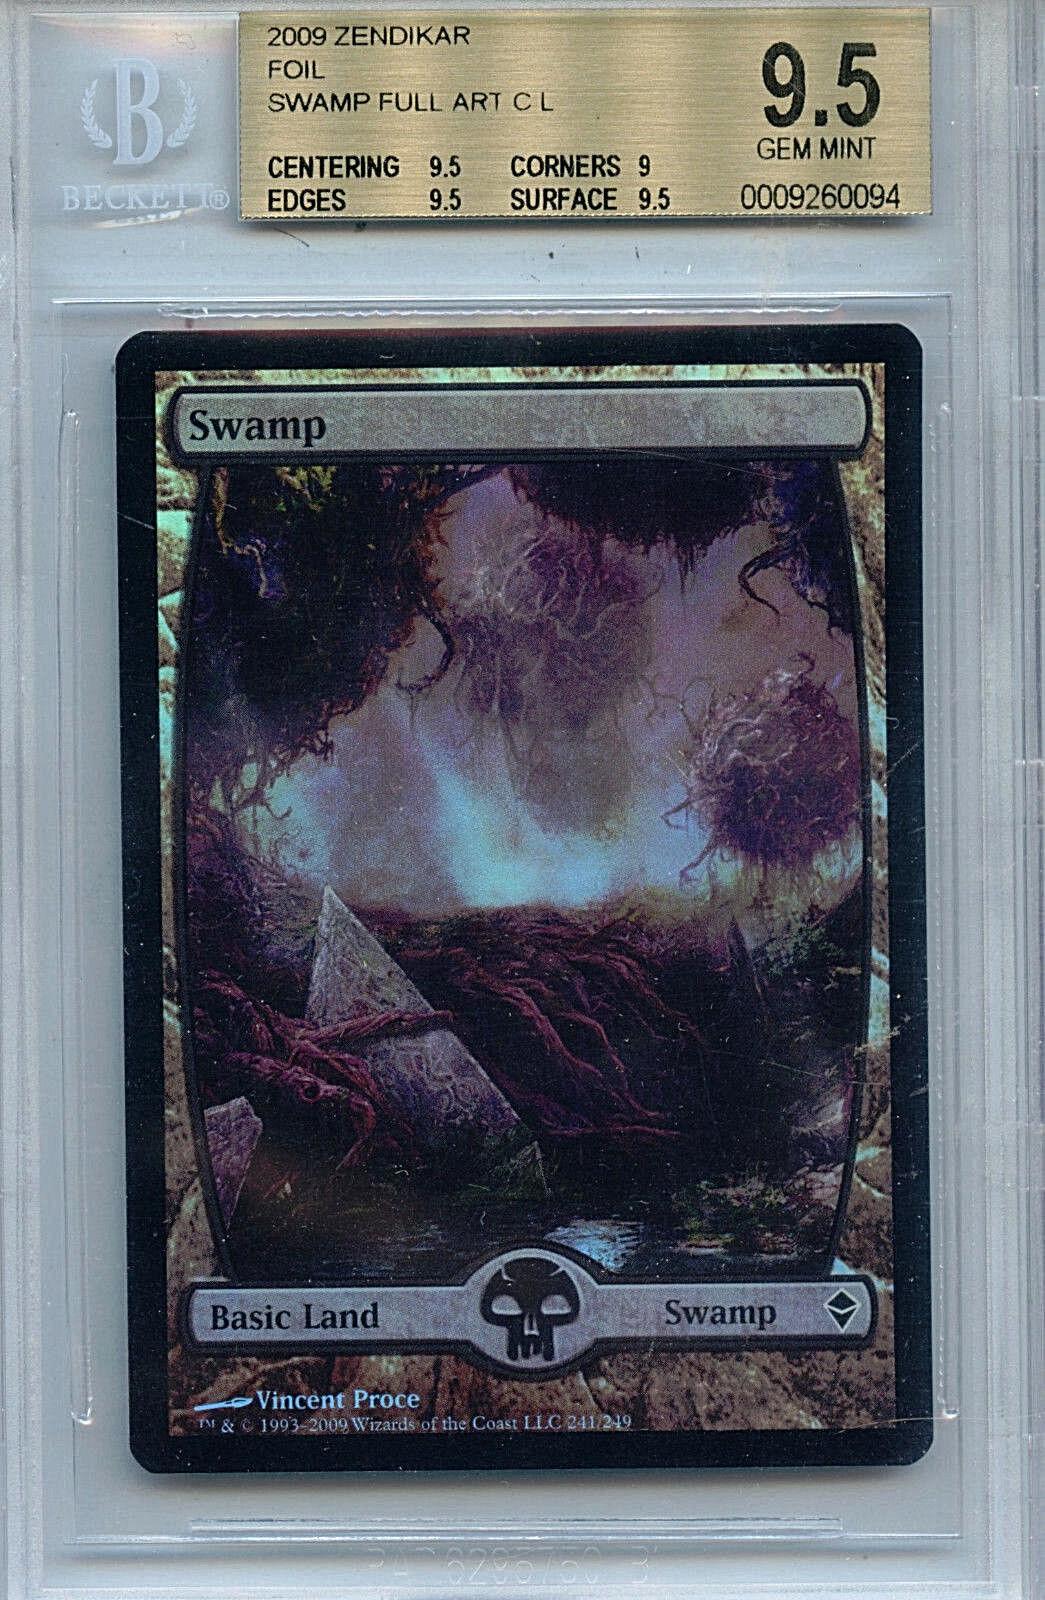 MTG MTG MTG Swamp BGS 9.5 Gem Mint Zendikar Foil Full Art Card Amricons 0064 27f756